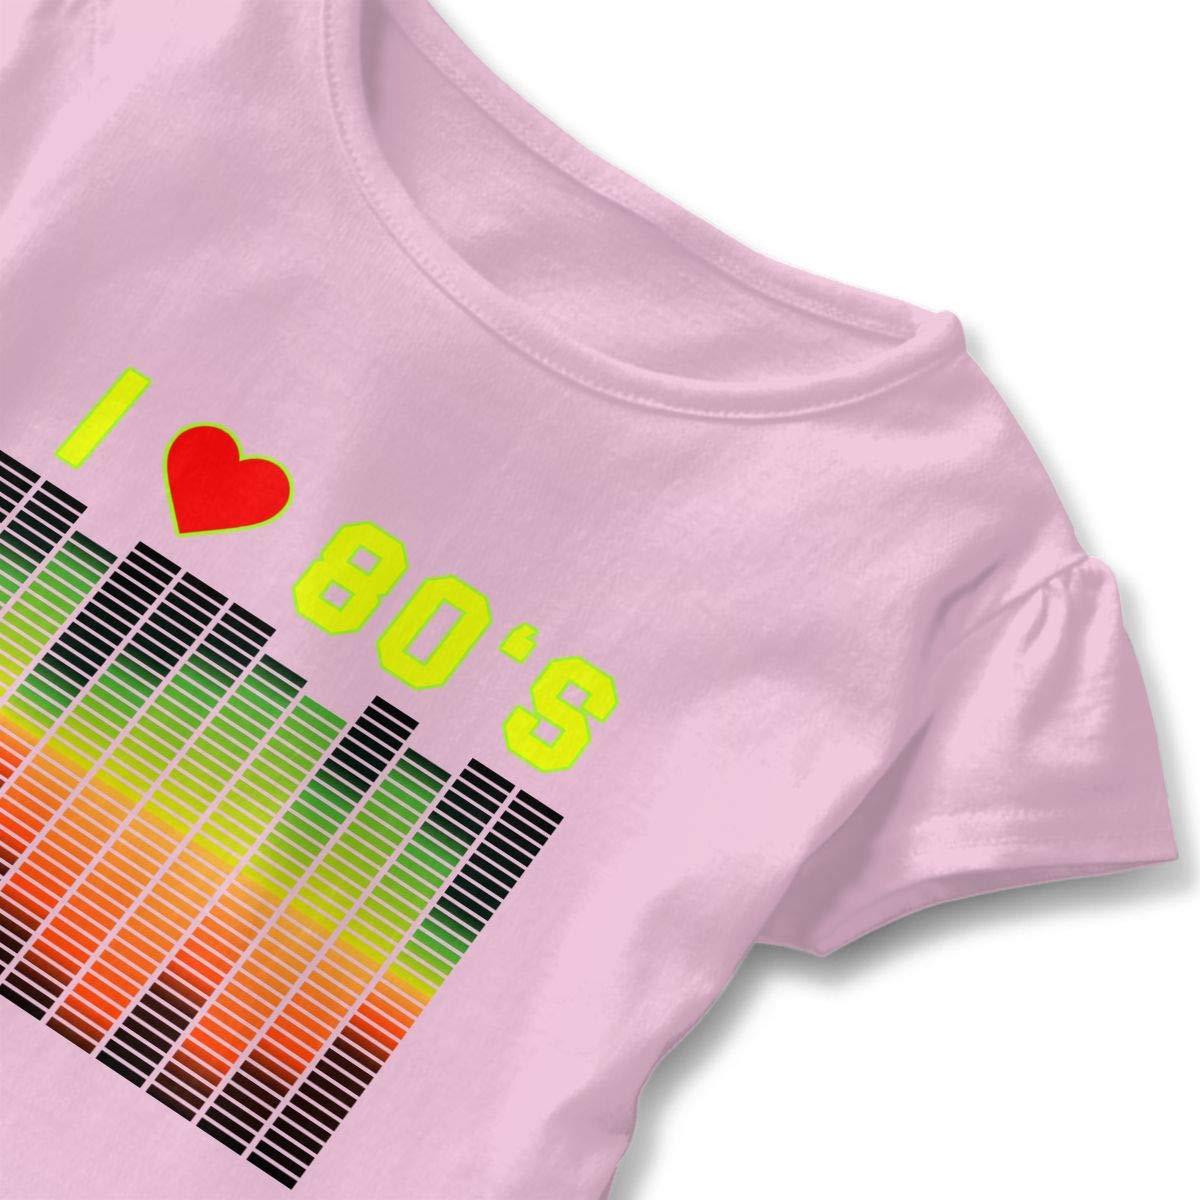 2-6 Years Love Cows Baby Girls Short Sleeve Ruffle Tee Cotton Kids T Shirts